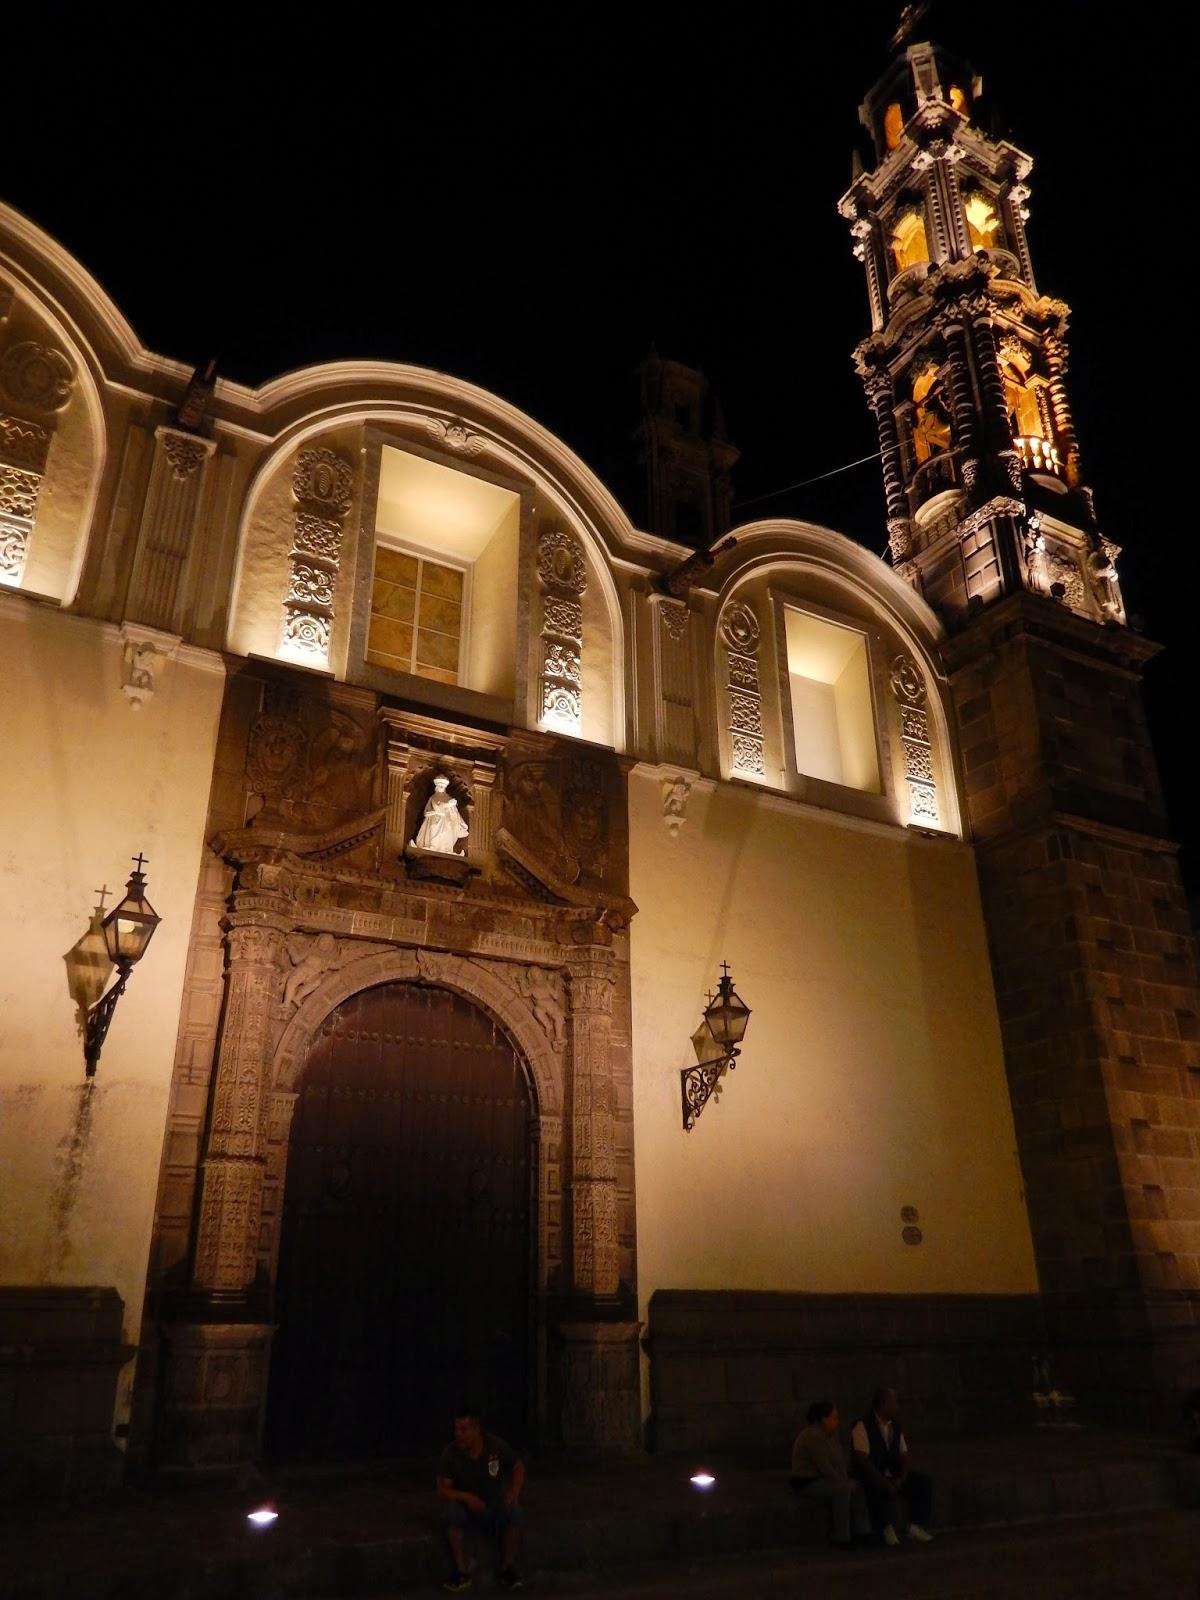 Iglesia, puebla, mexico